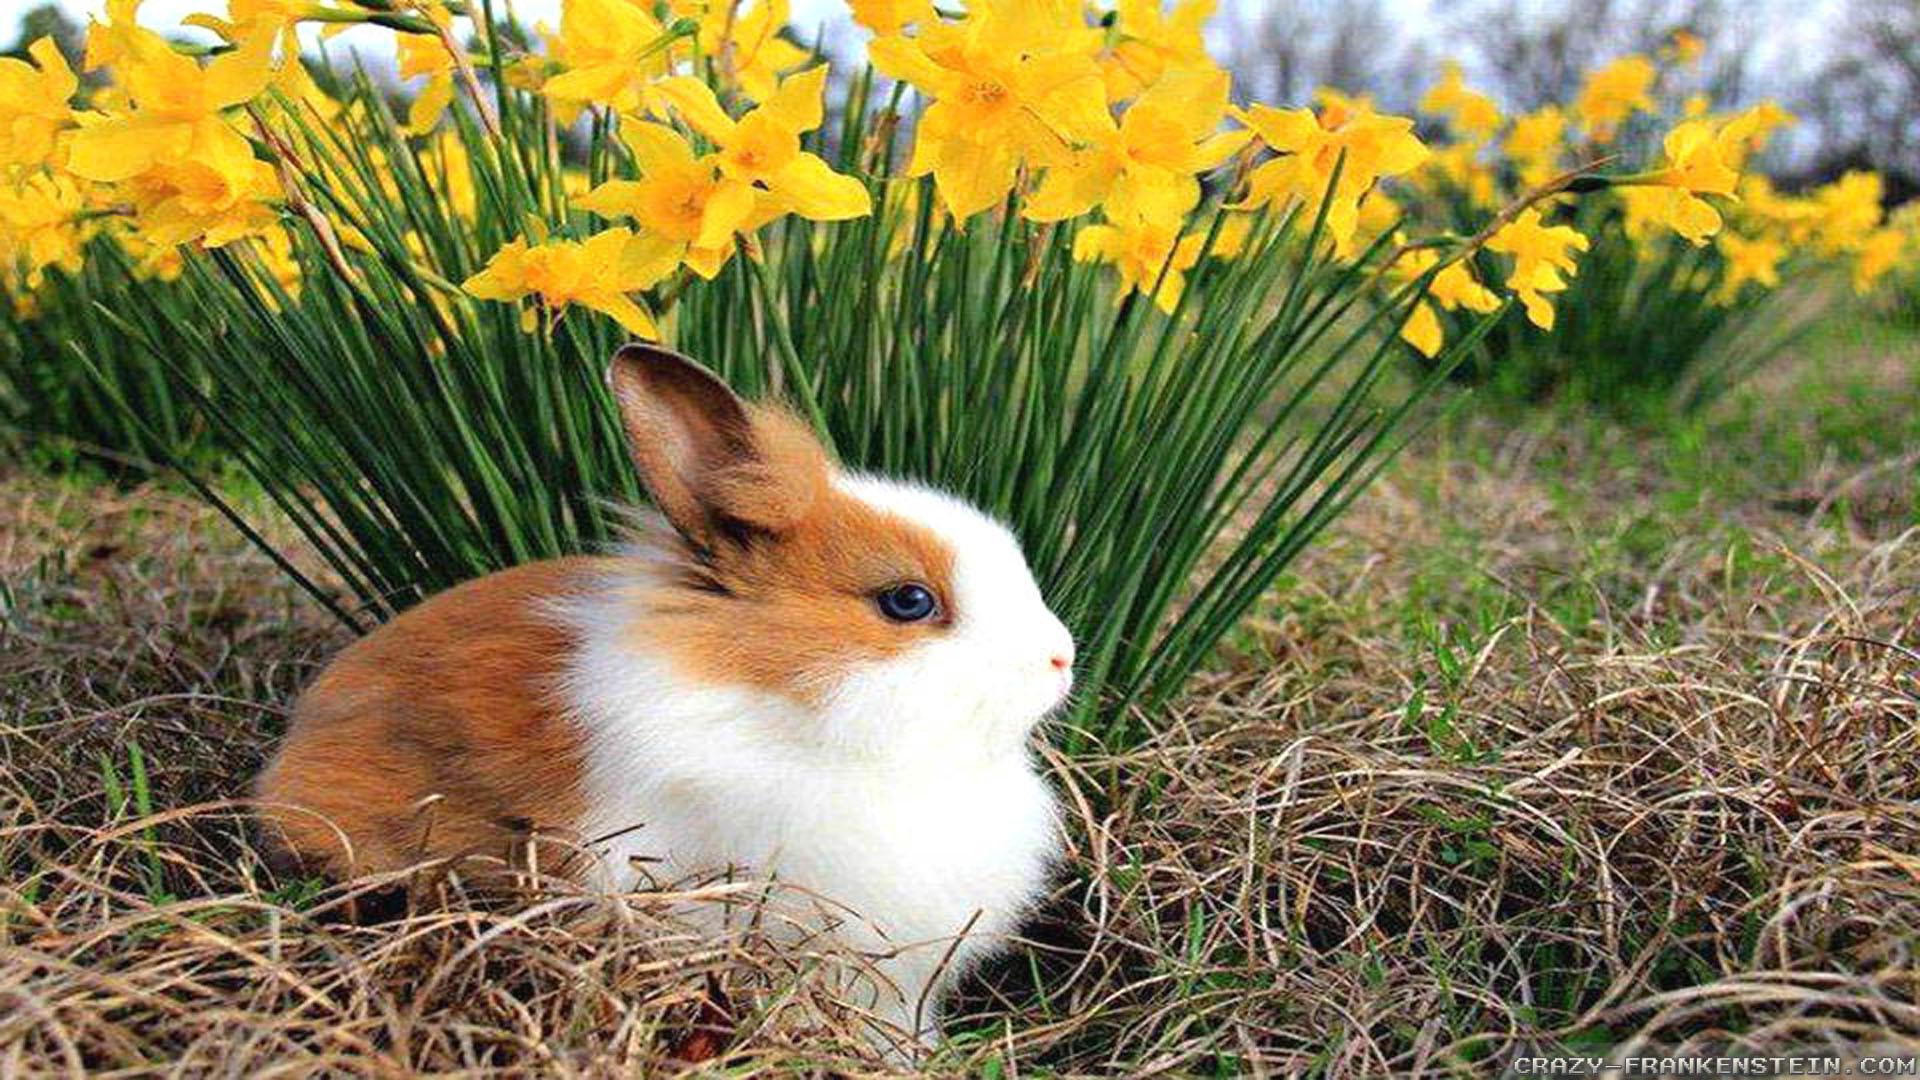 Spring Animal HD Desktop Wallpapers 7647 – HD Wallpapers Site